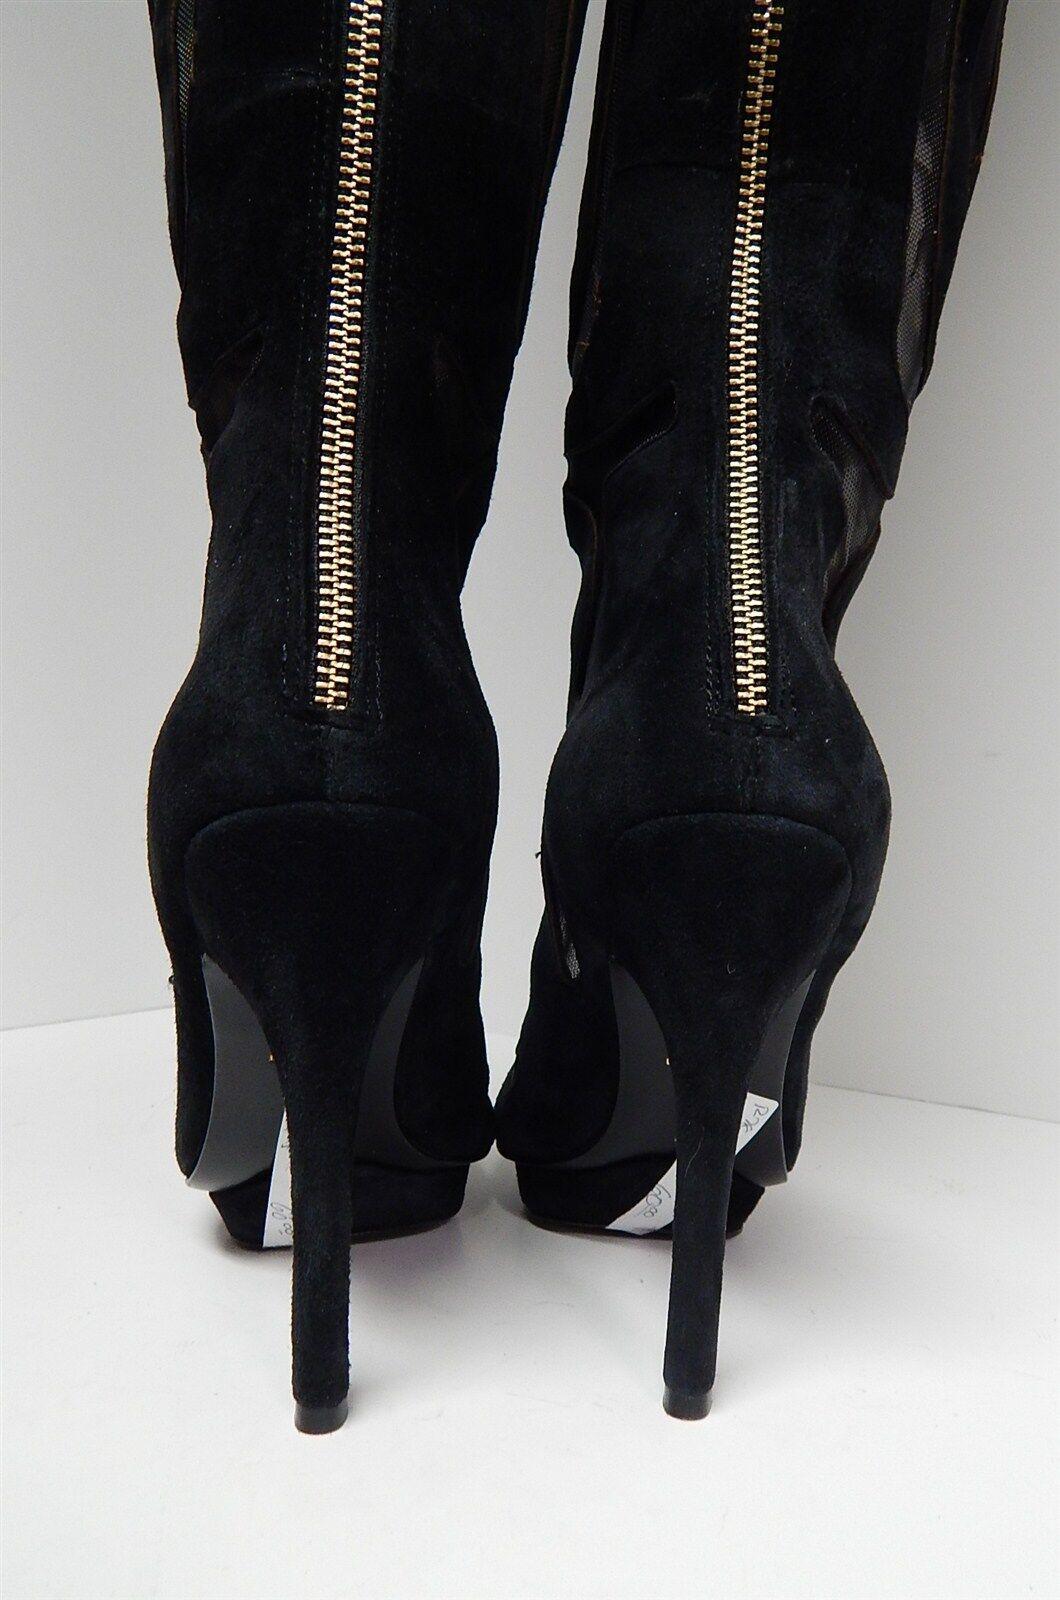 Charles Jourdan Black Suede Leather Cut Out Thigh High Tall Tall Tall Fashion Boots 7 M 269e95